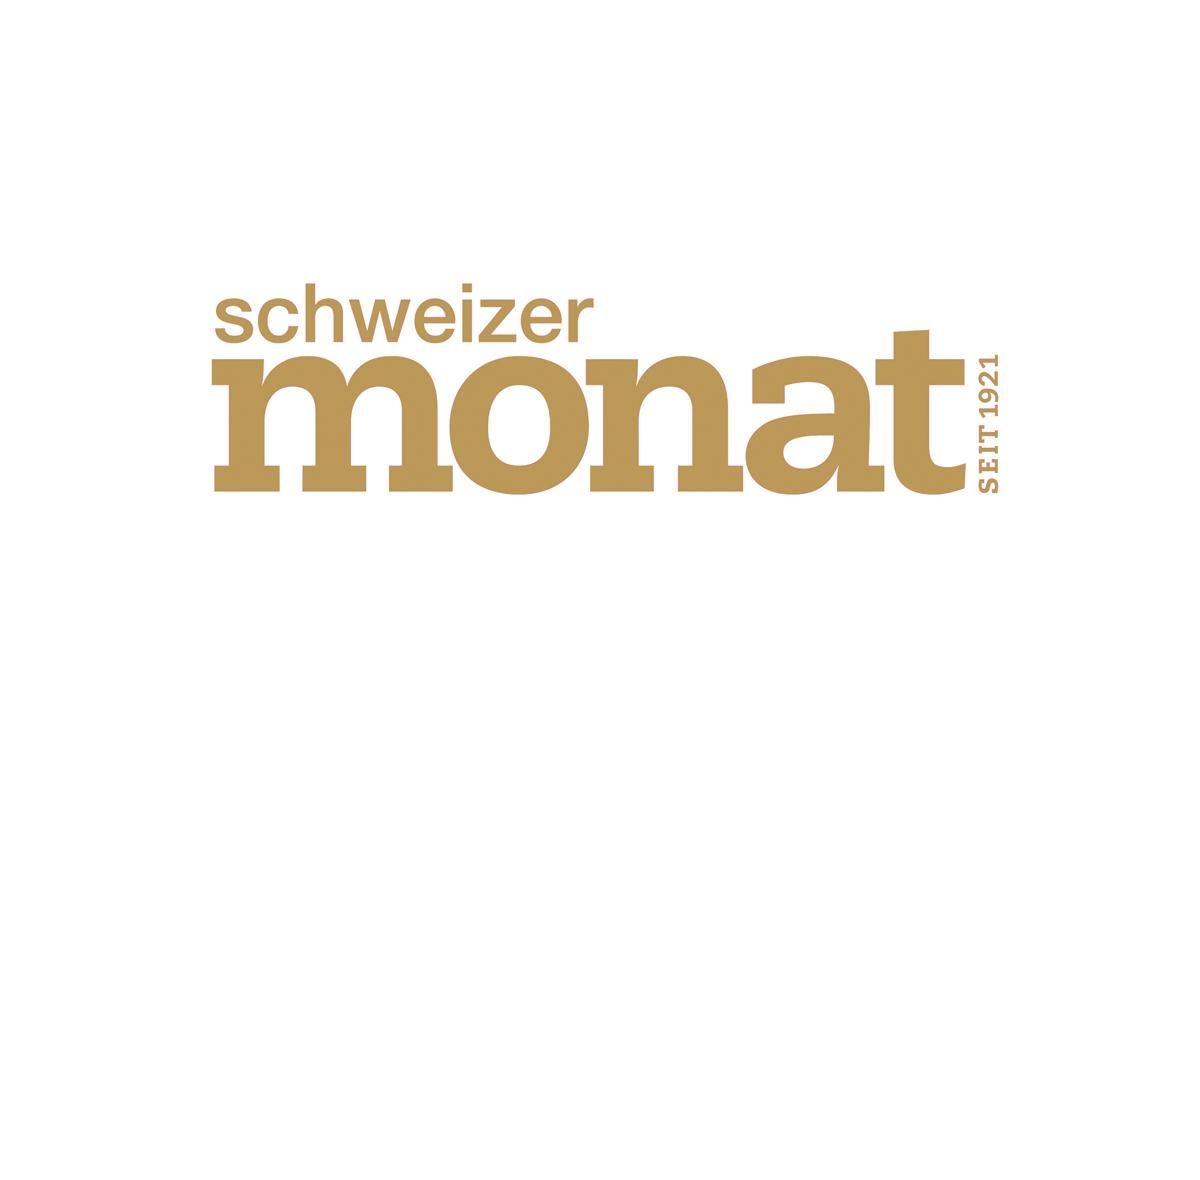 schweizer monat logo